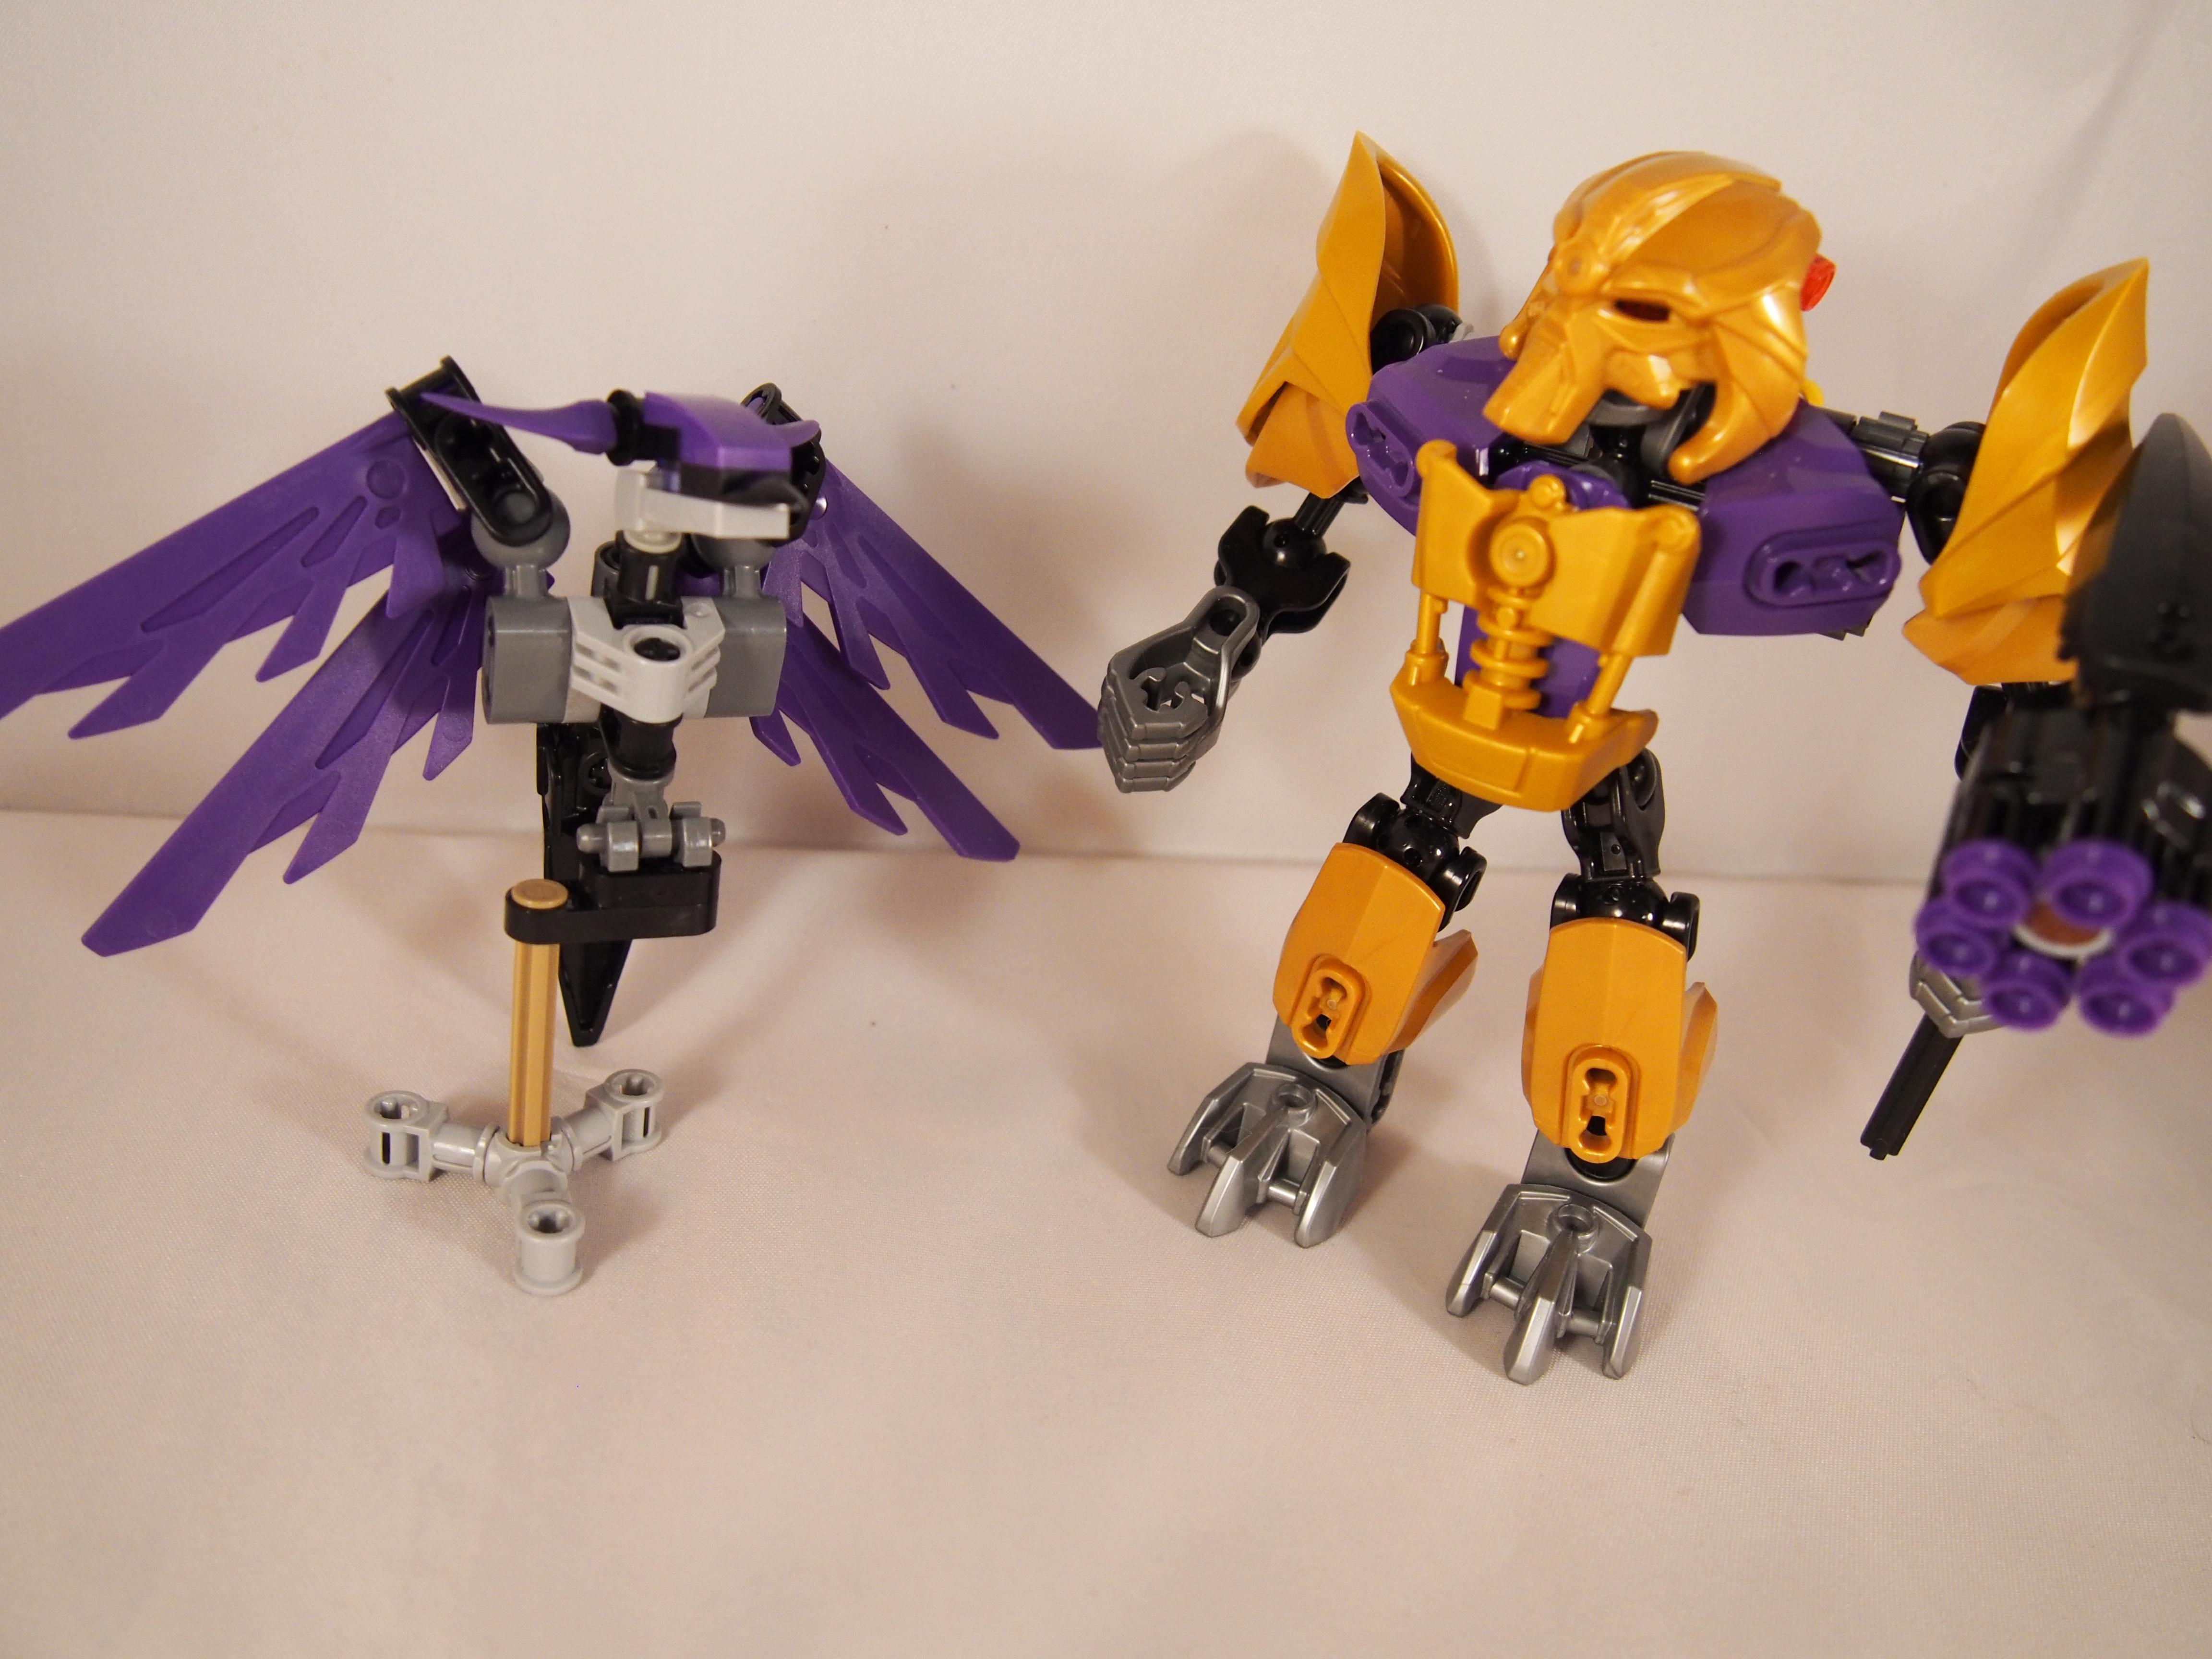 Лего Биониклы (Bionicle) - каталог наборов с инструкциями 95